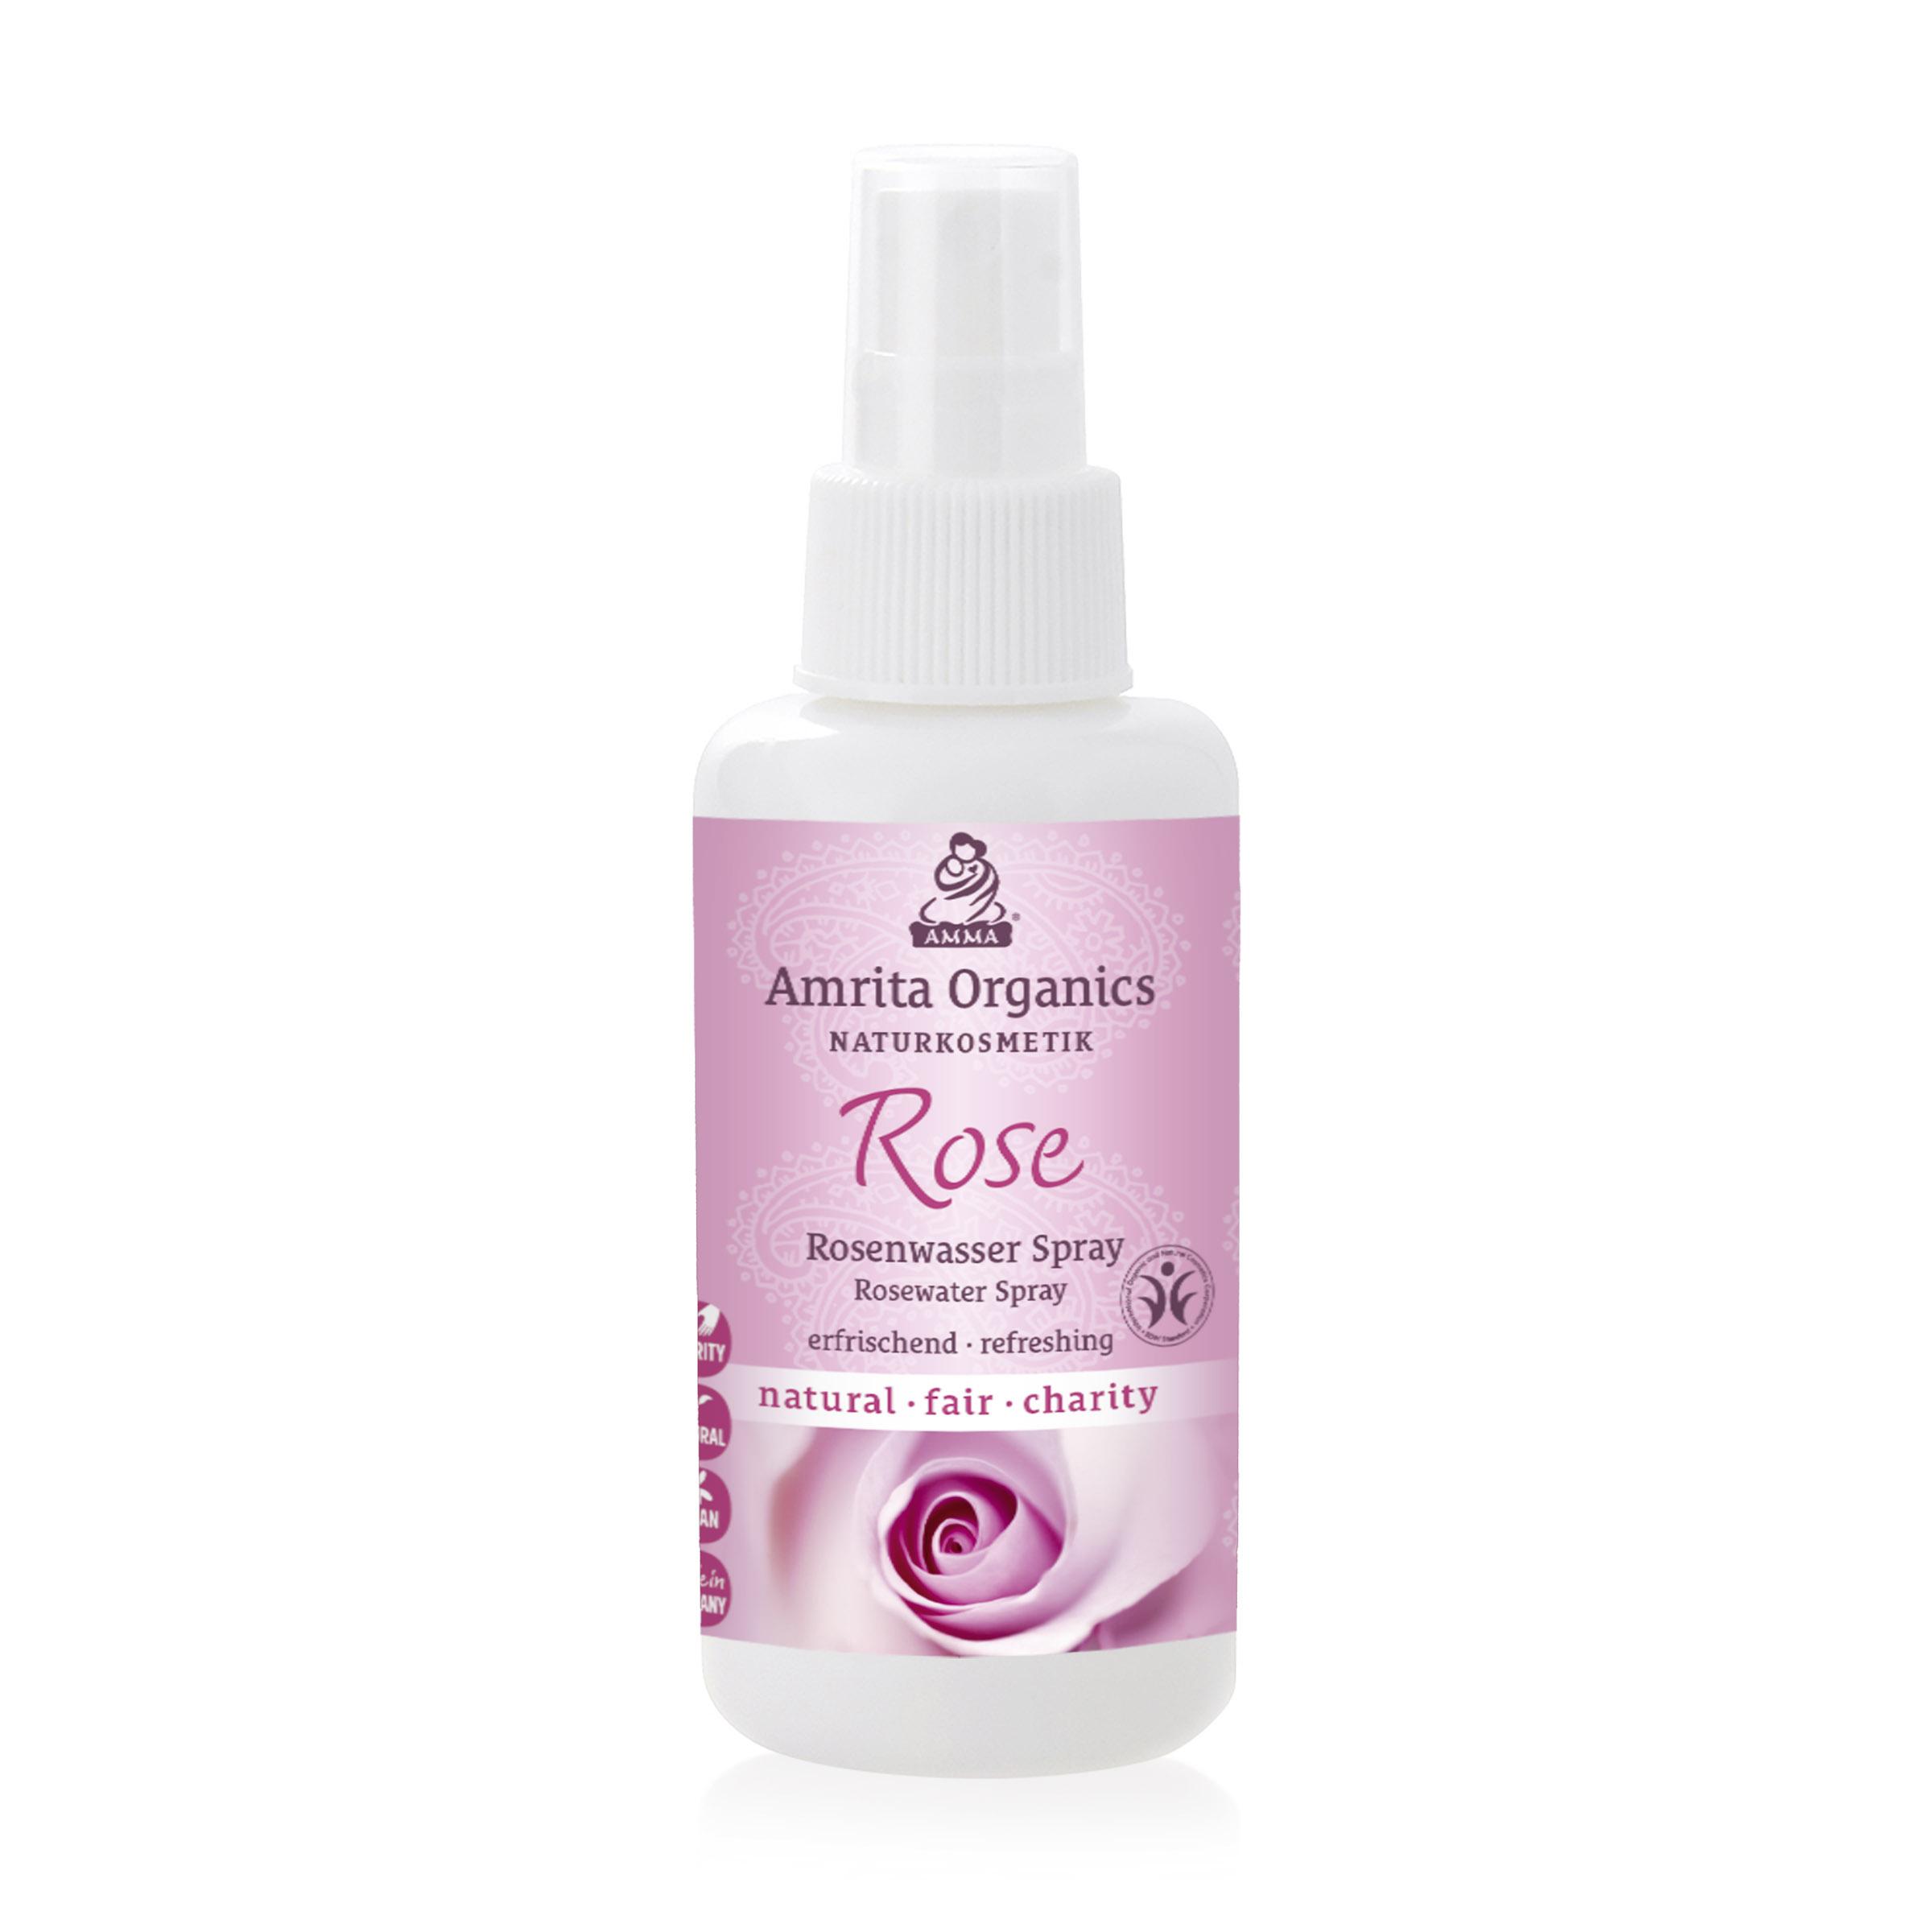 Rosenwasser Spray